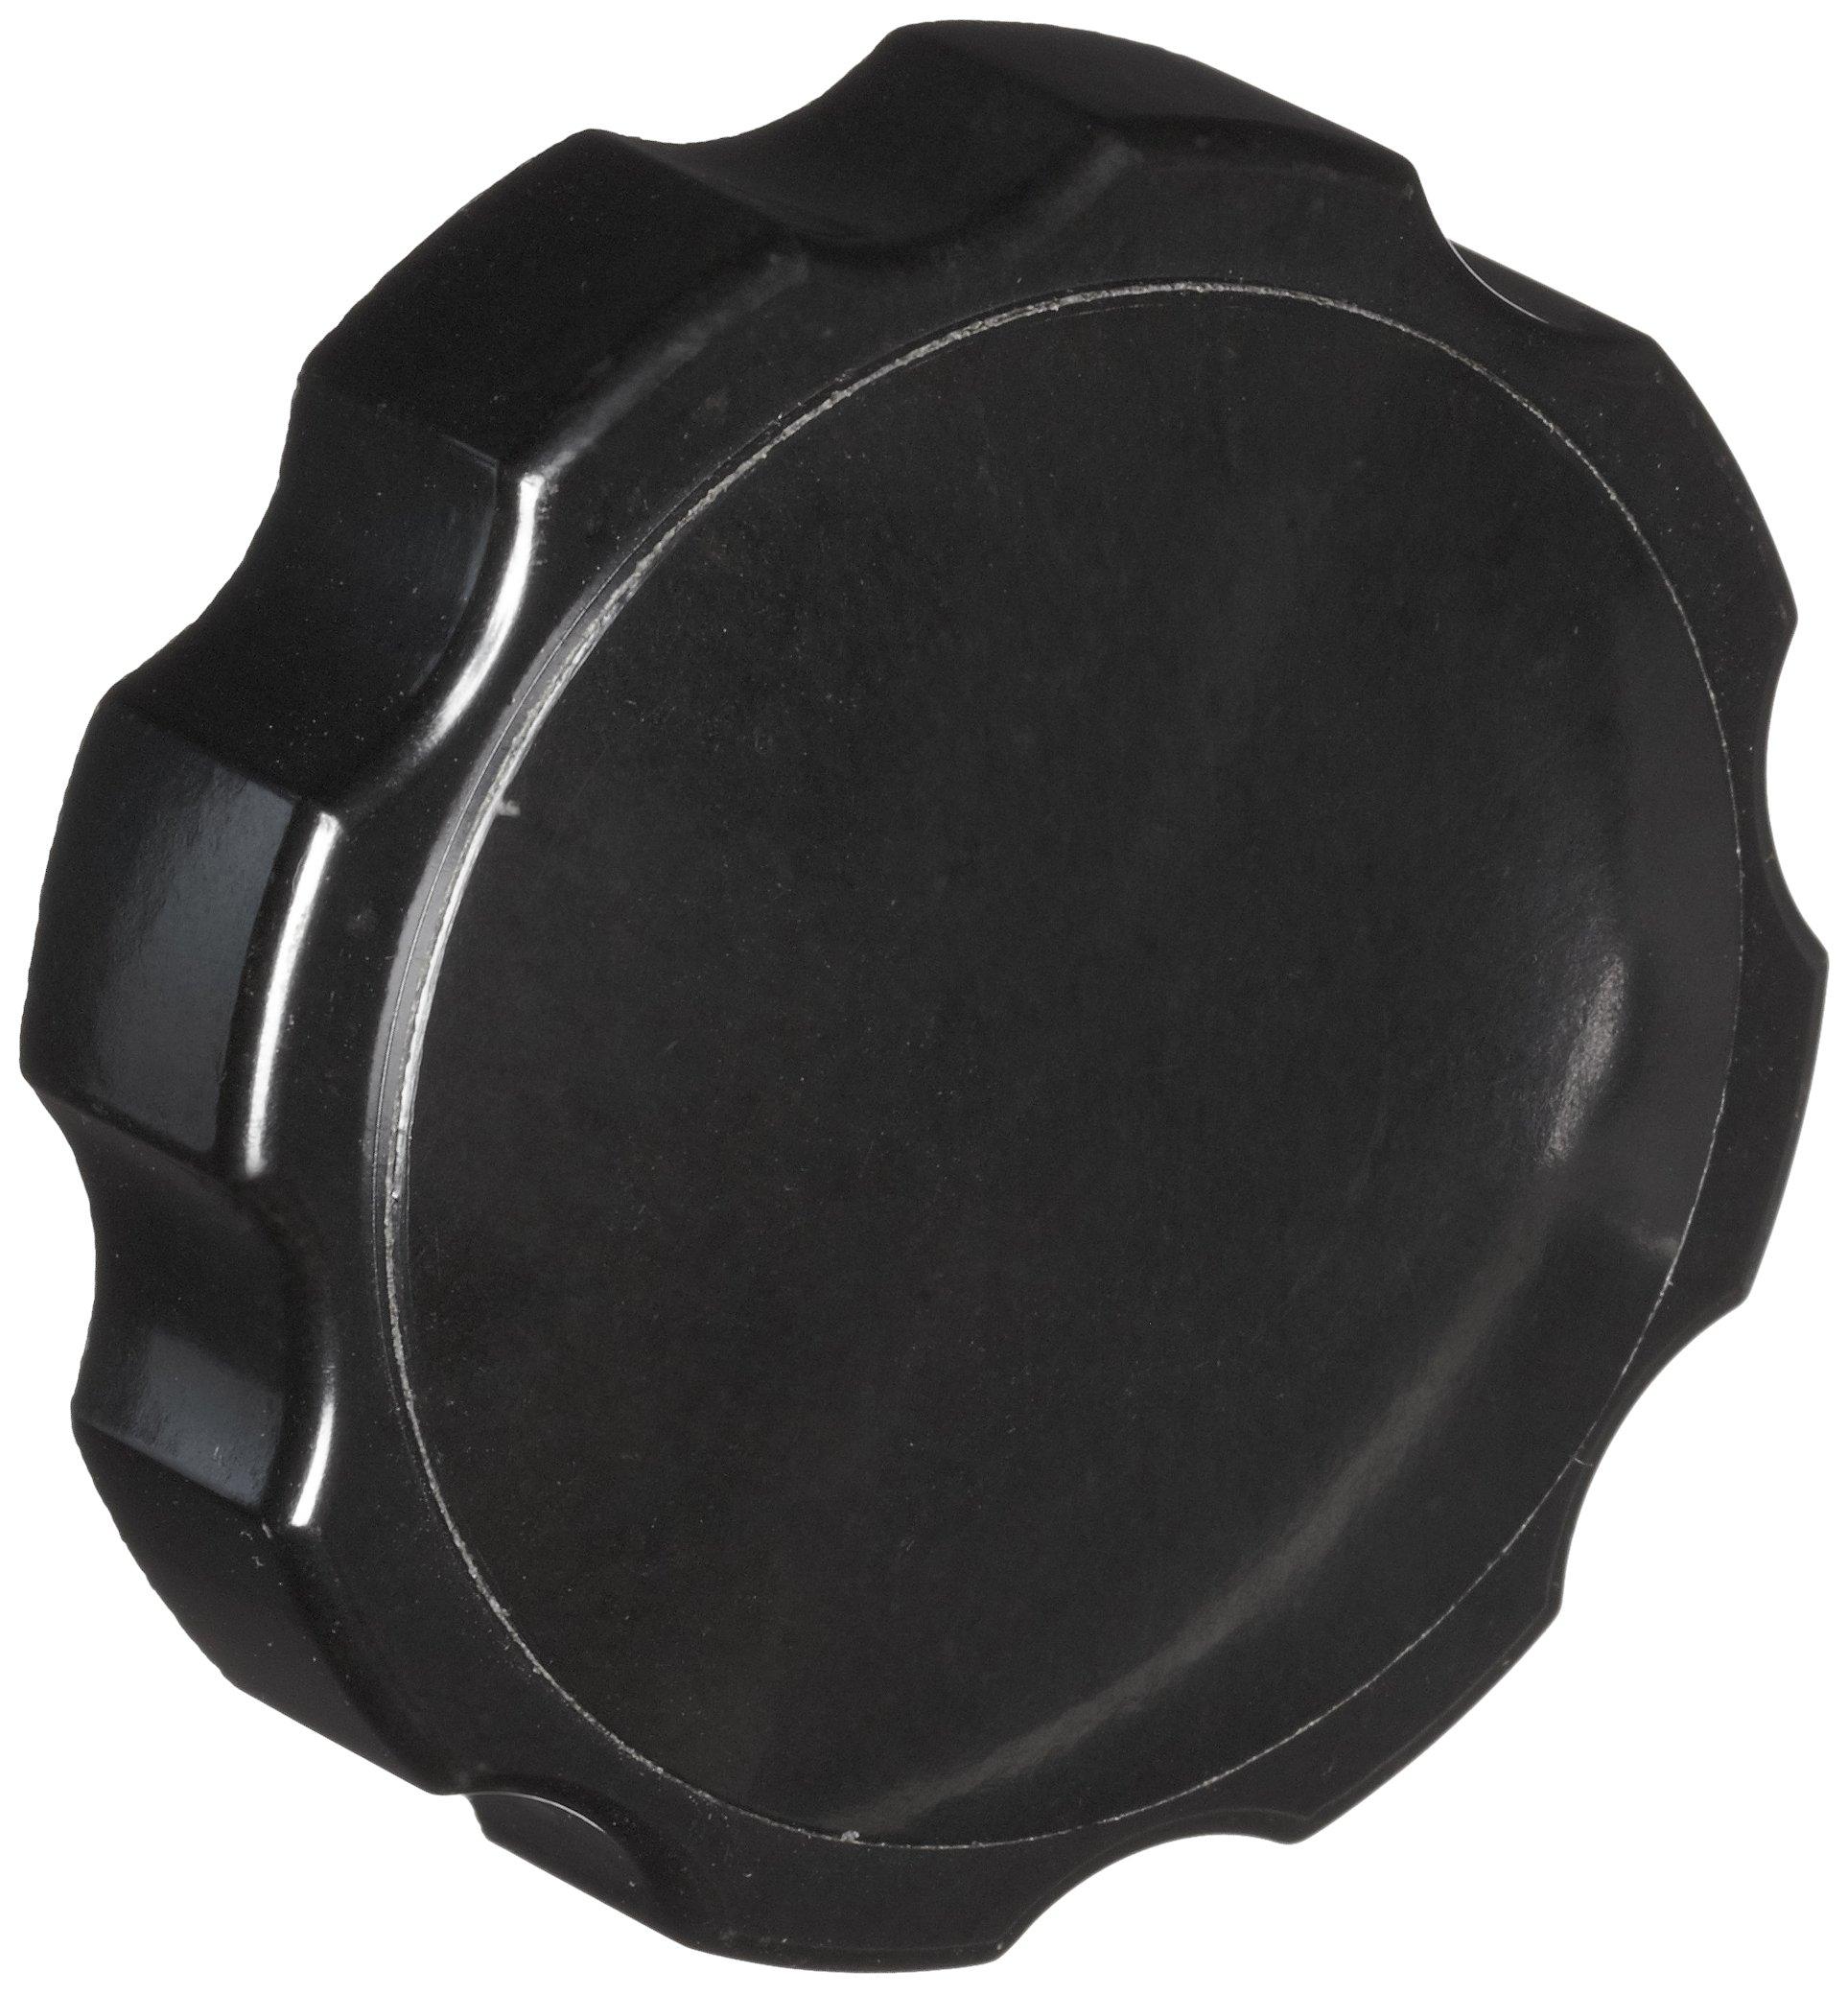 DimcoGray Black Phenolic Fluted Torque Knob, Brass Insert: 3/8-16'' Thread x 1/2'' Depth, 2-3/8'' Diameter x 1-5/16'' Height x 1-1/4'' Hub Dia x 5/8'' Hub Length (Pack of 10)